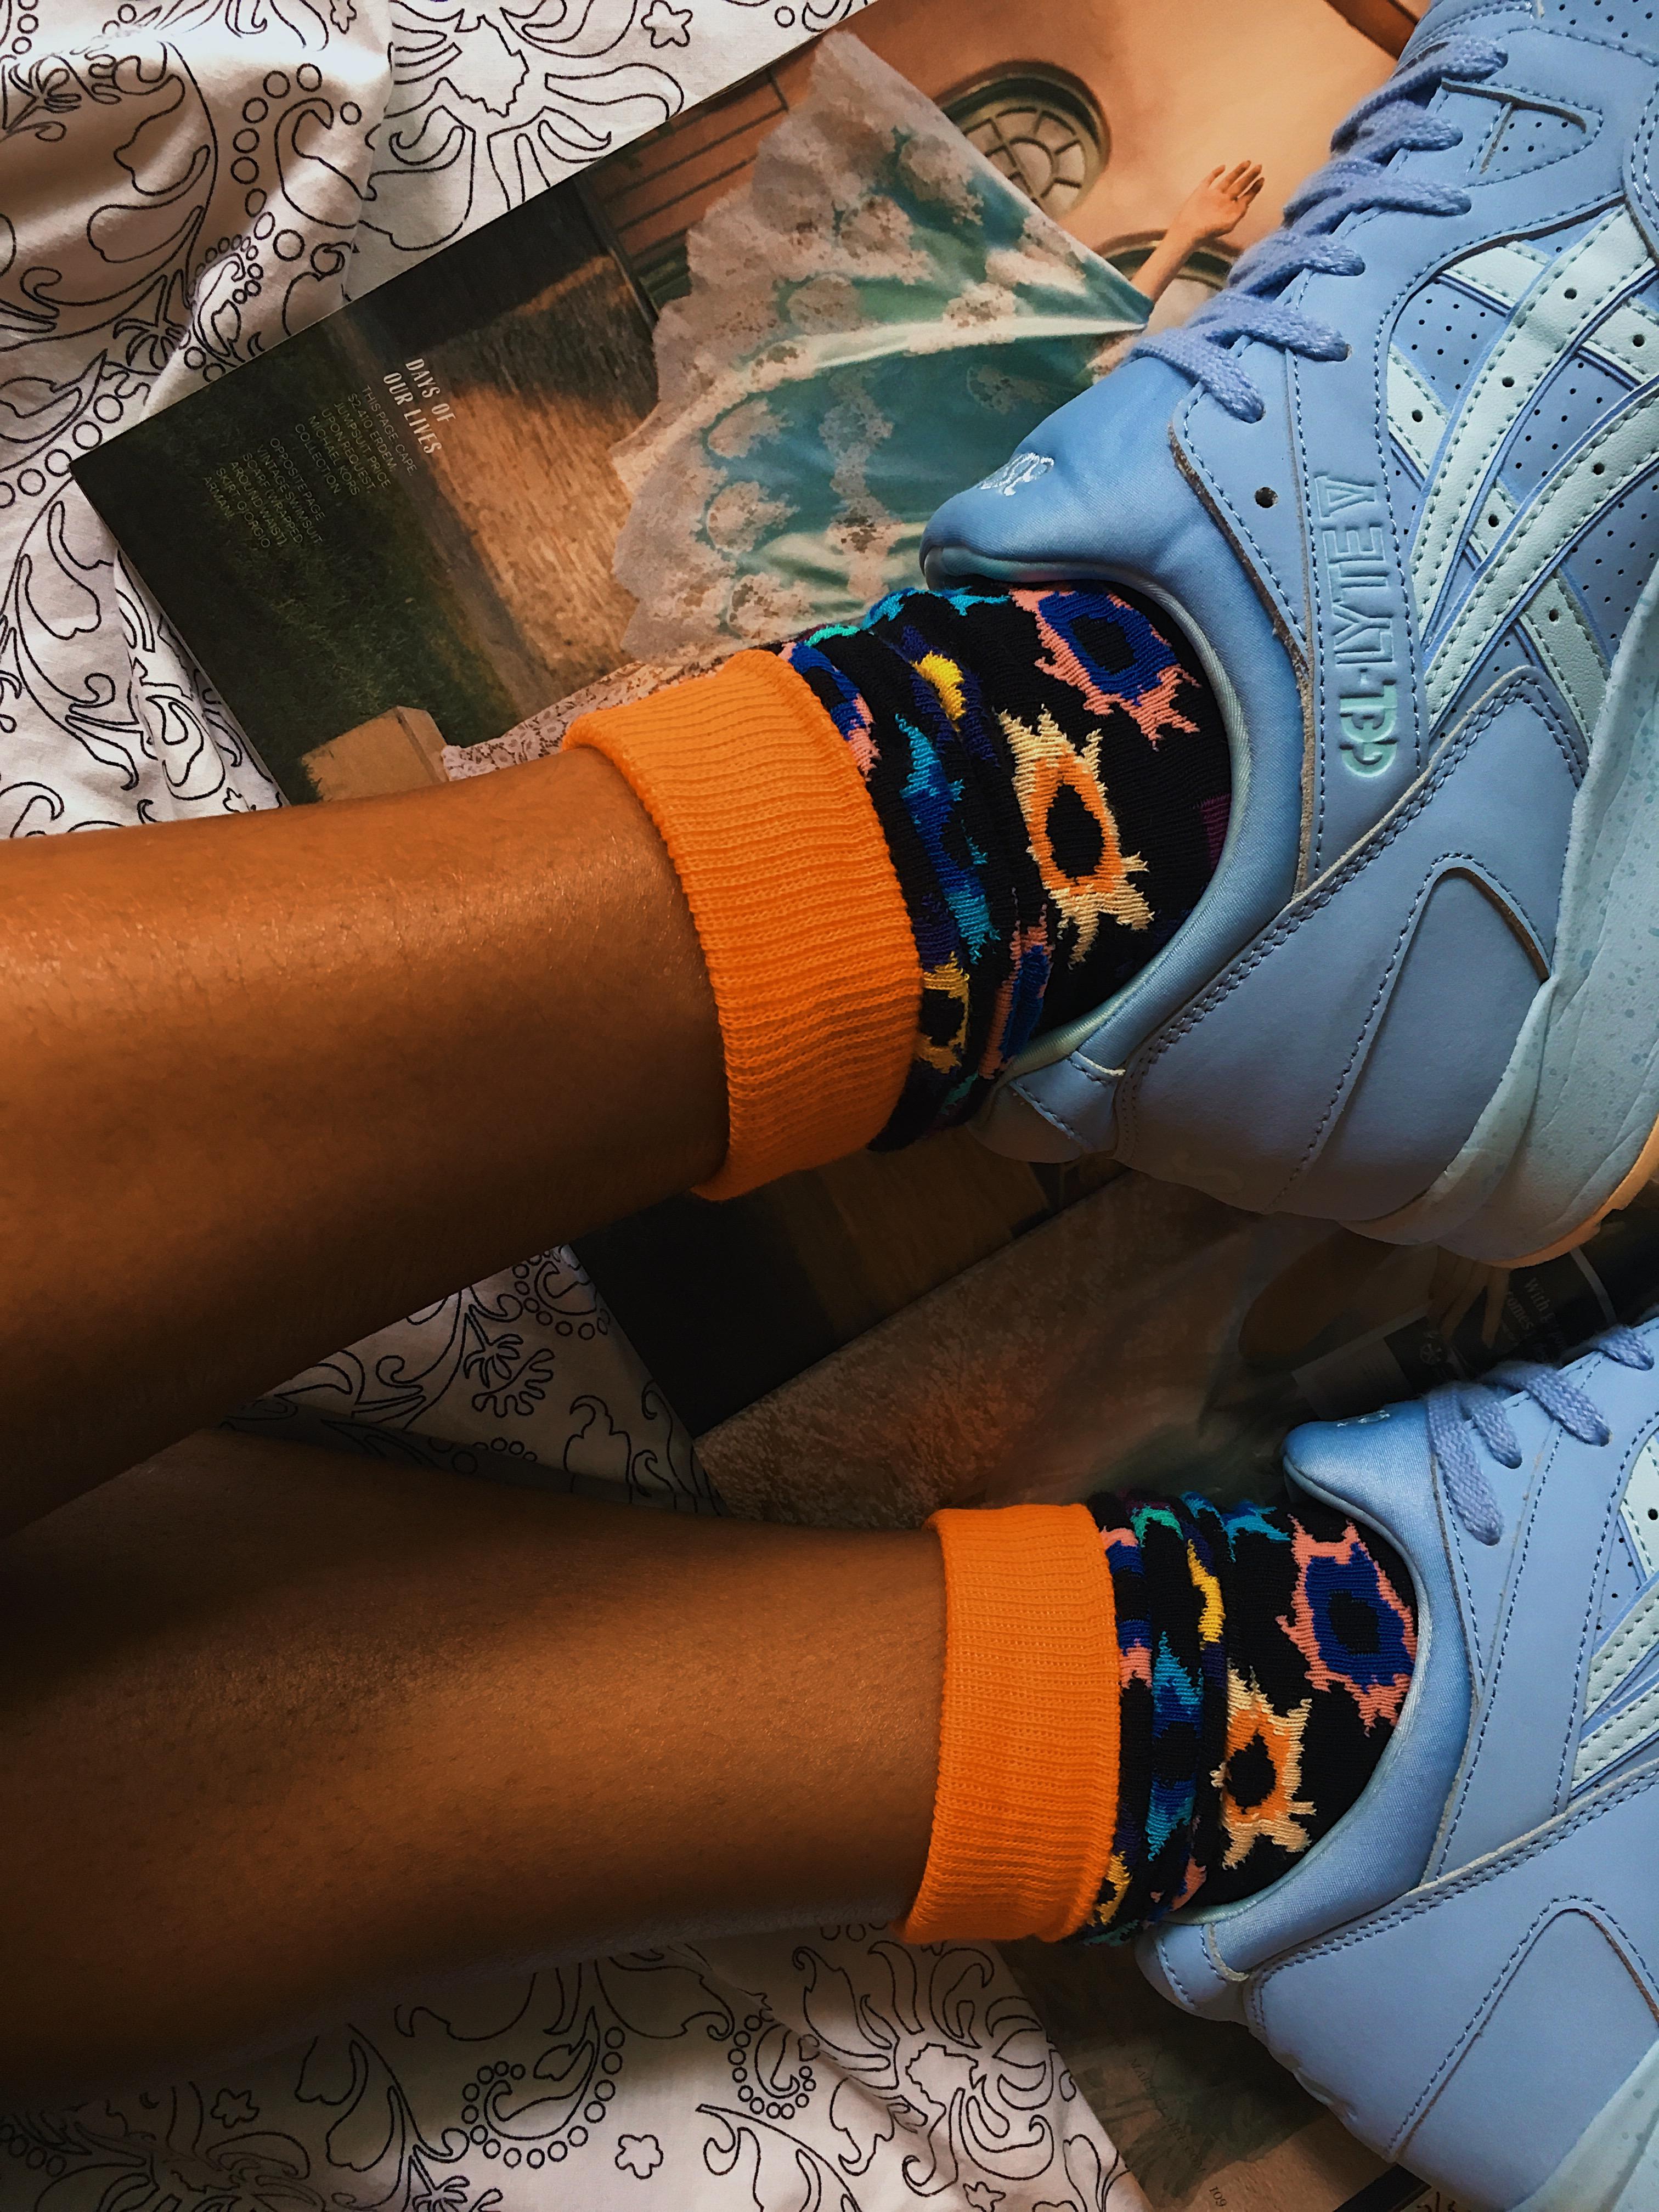 happy socks-colorful socks-asics tiger-gel lyte v-wear who you are-blue sneakers-lcm-printed socks